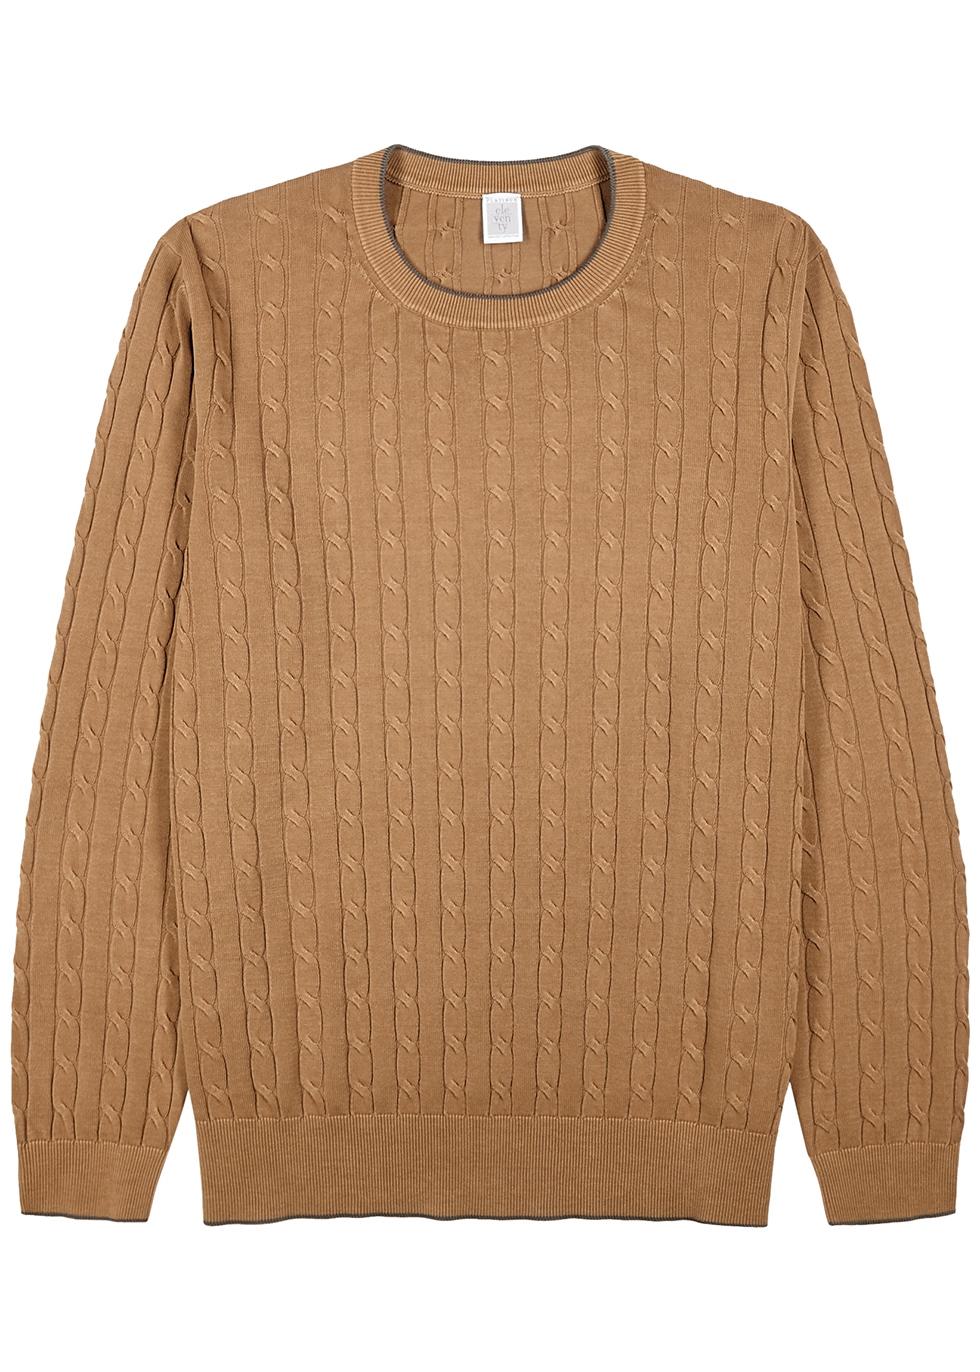 Camel cable-knit cotton jumper